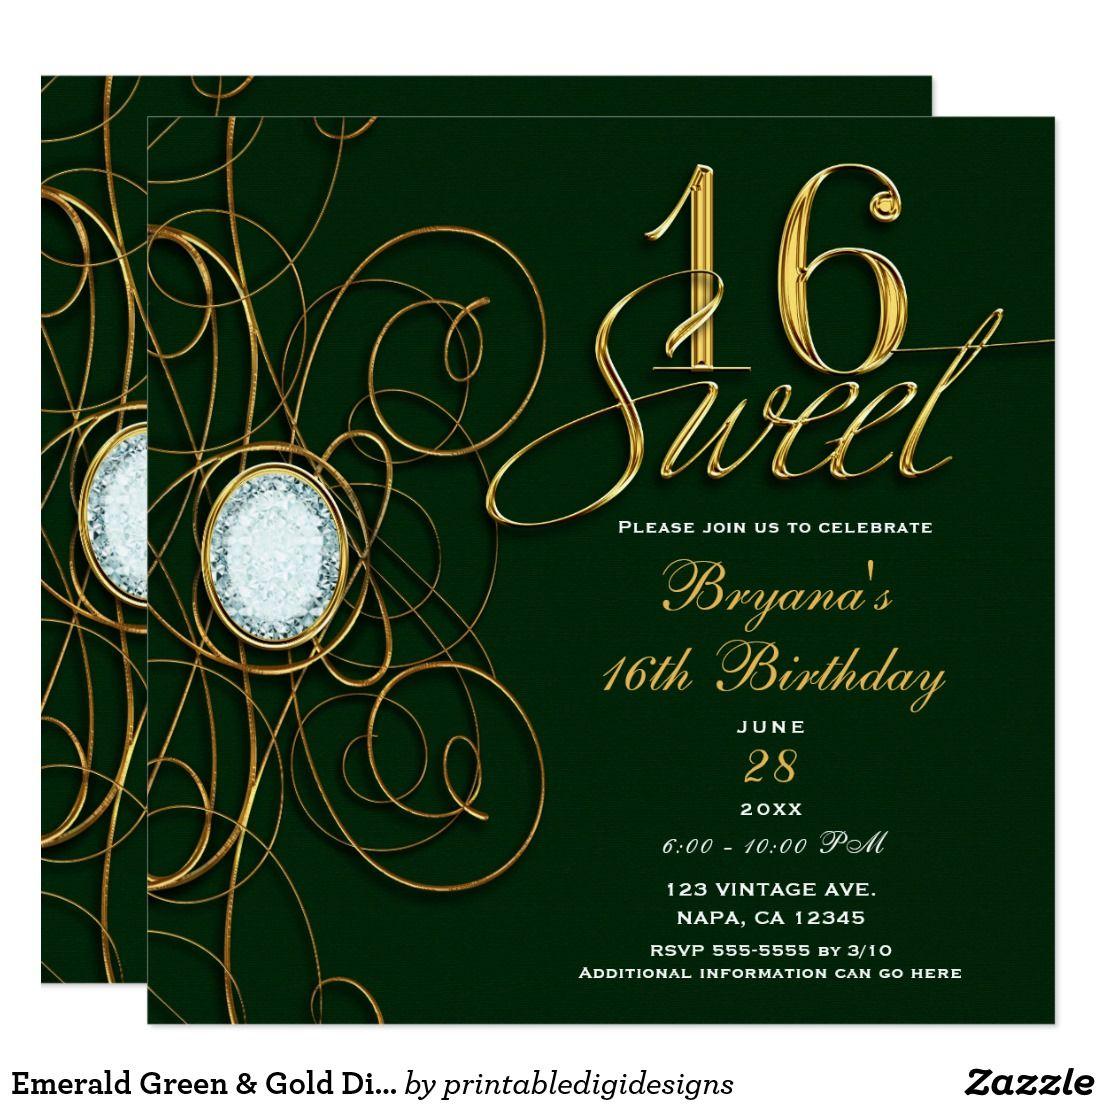 Emerald Green & Gold Diamond Sweet 16 Birthday Invitation